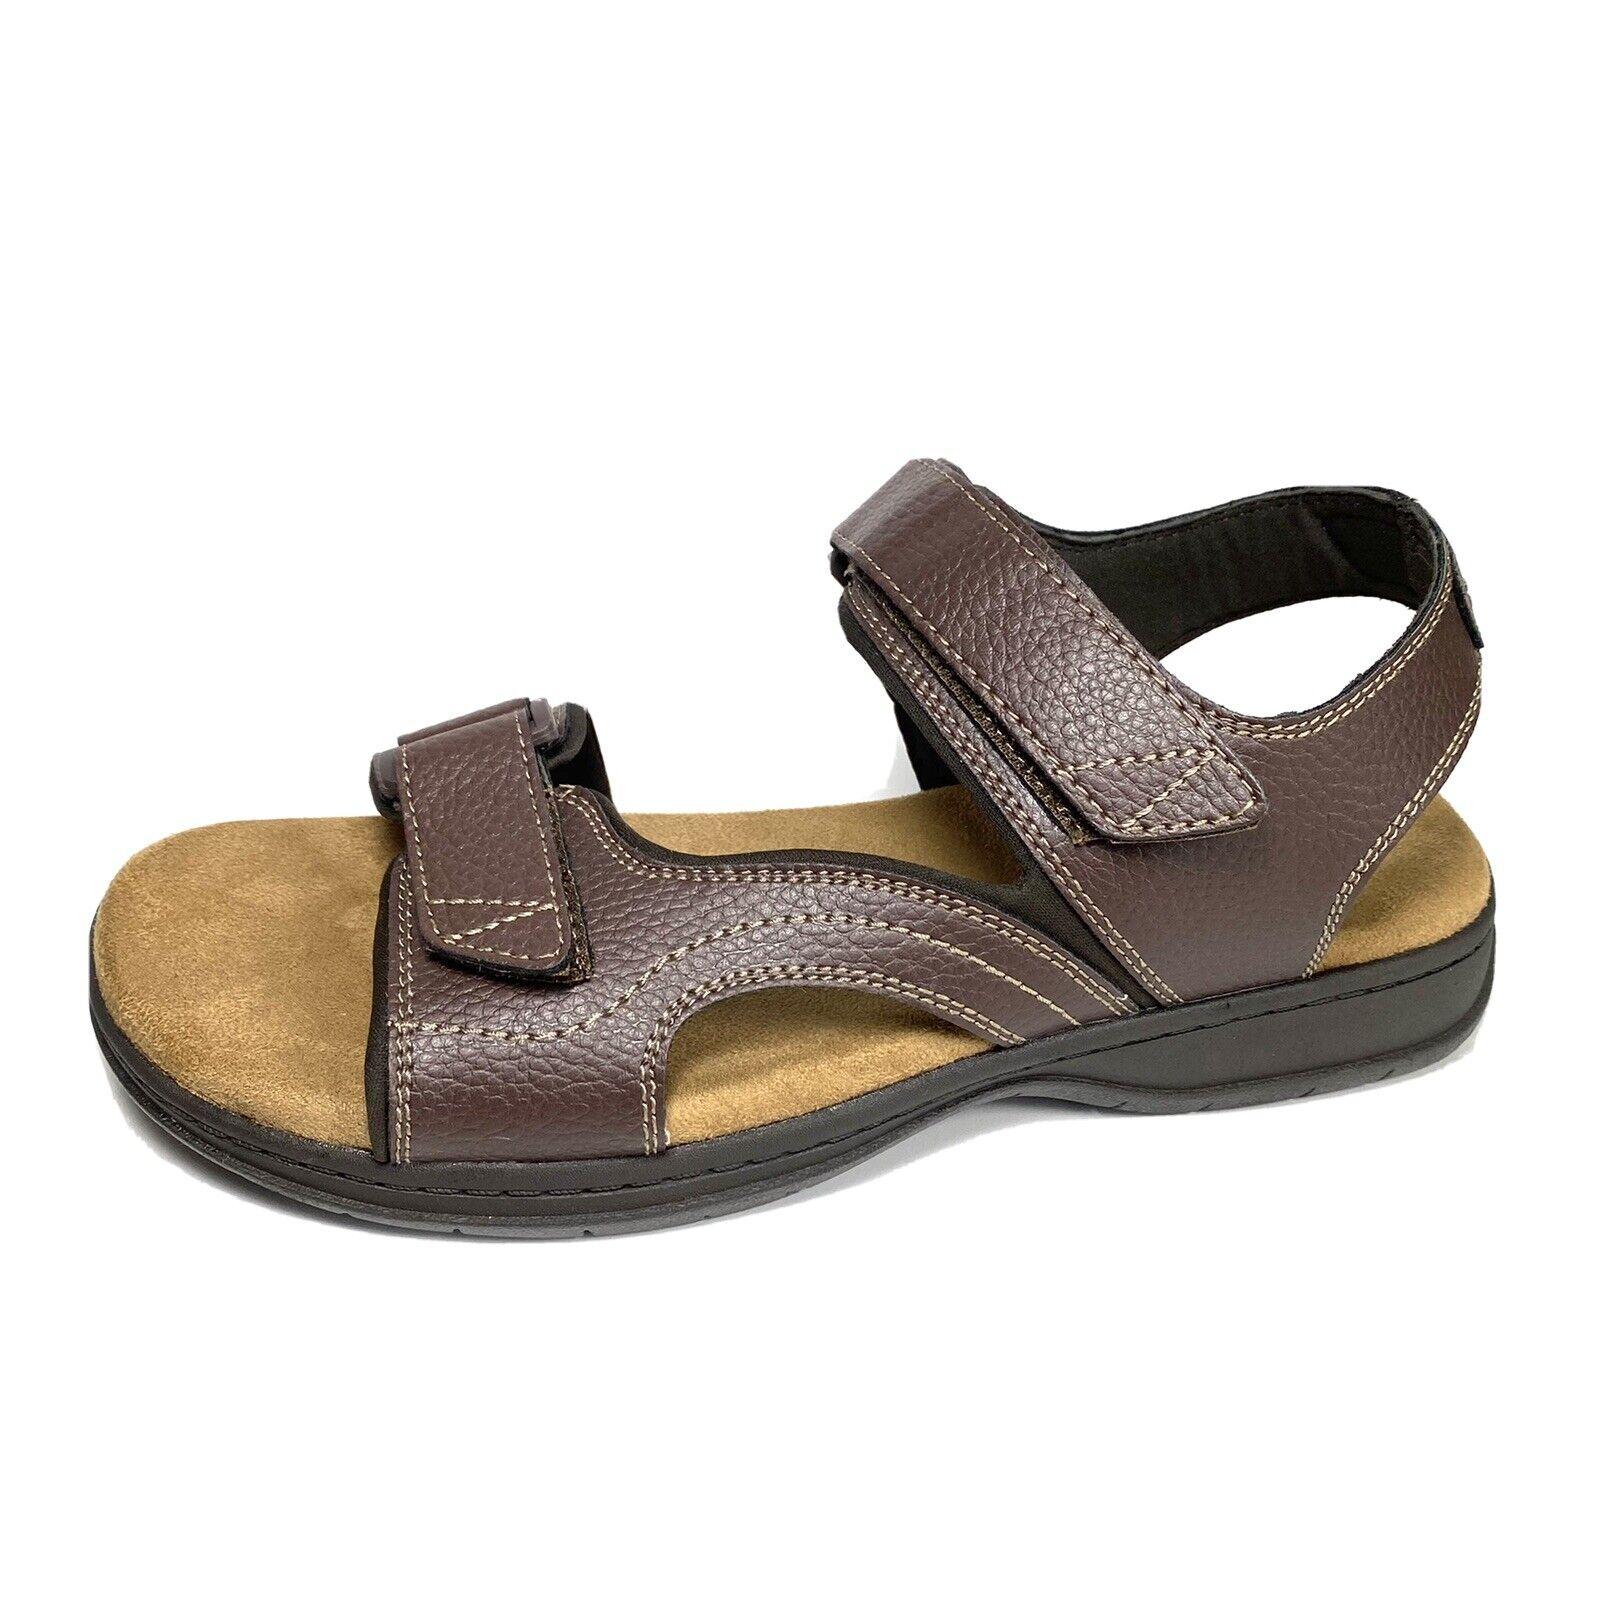 Dr. Scholl's Penn Mens Brown Leather Adjustable Sandals Ankle Strap Comfort 10 M